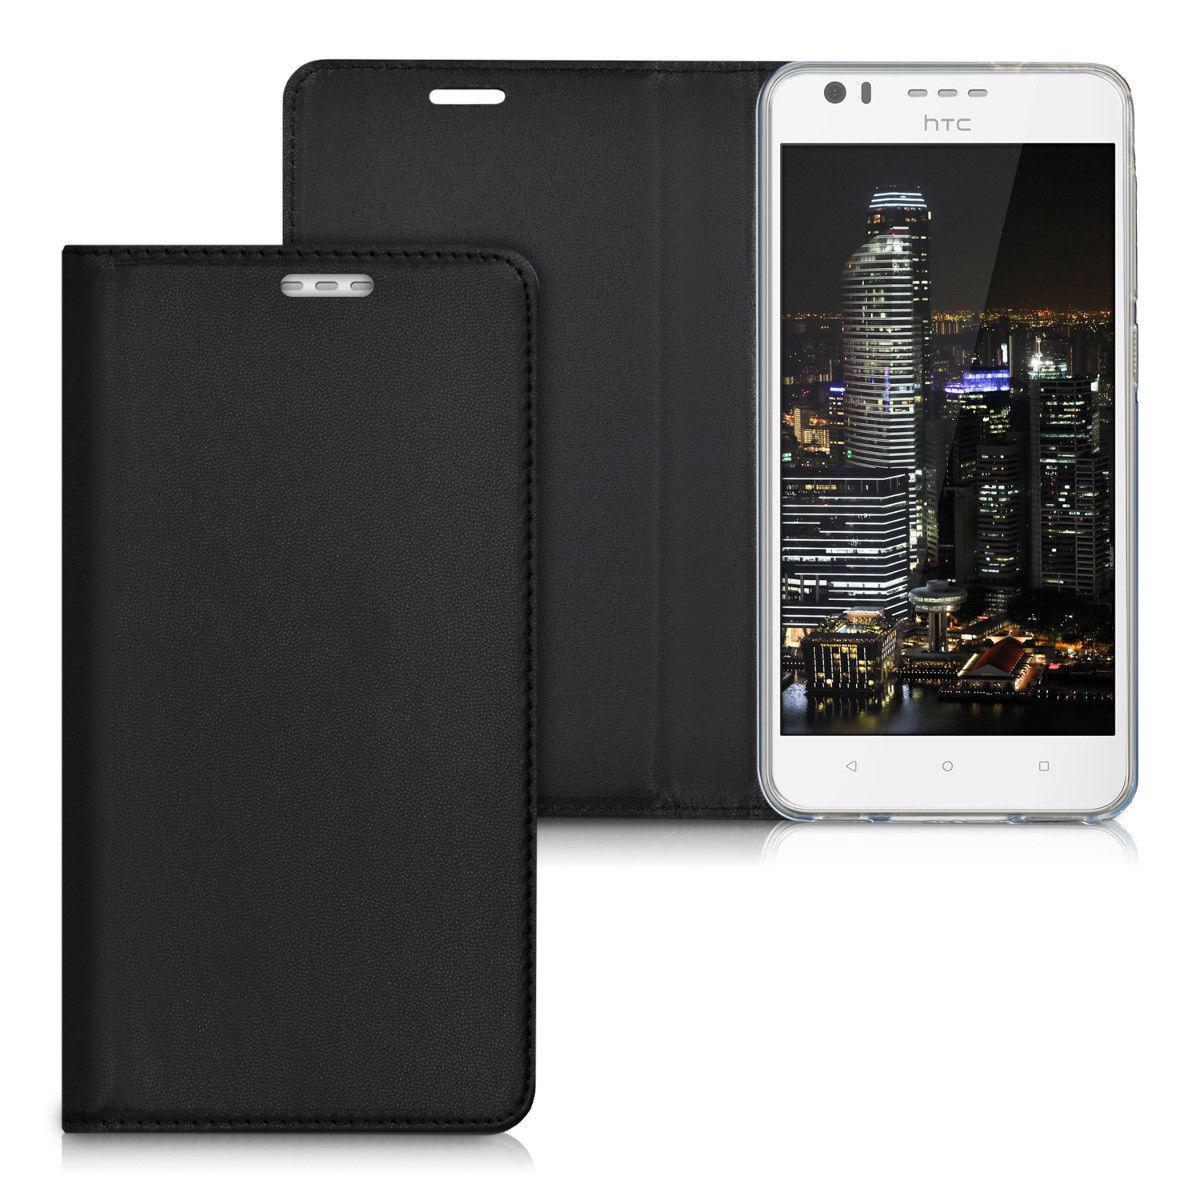 Pouzdro FLIP pro HTC Desire 10 Lifestyle černé